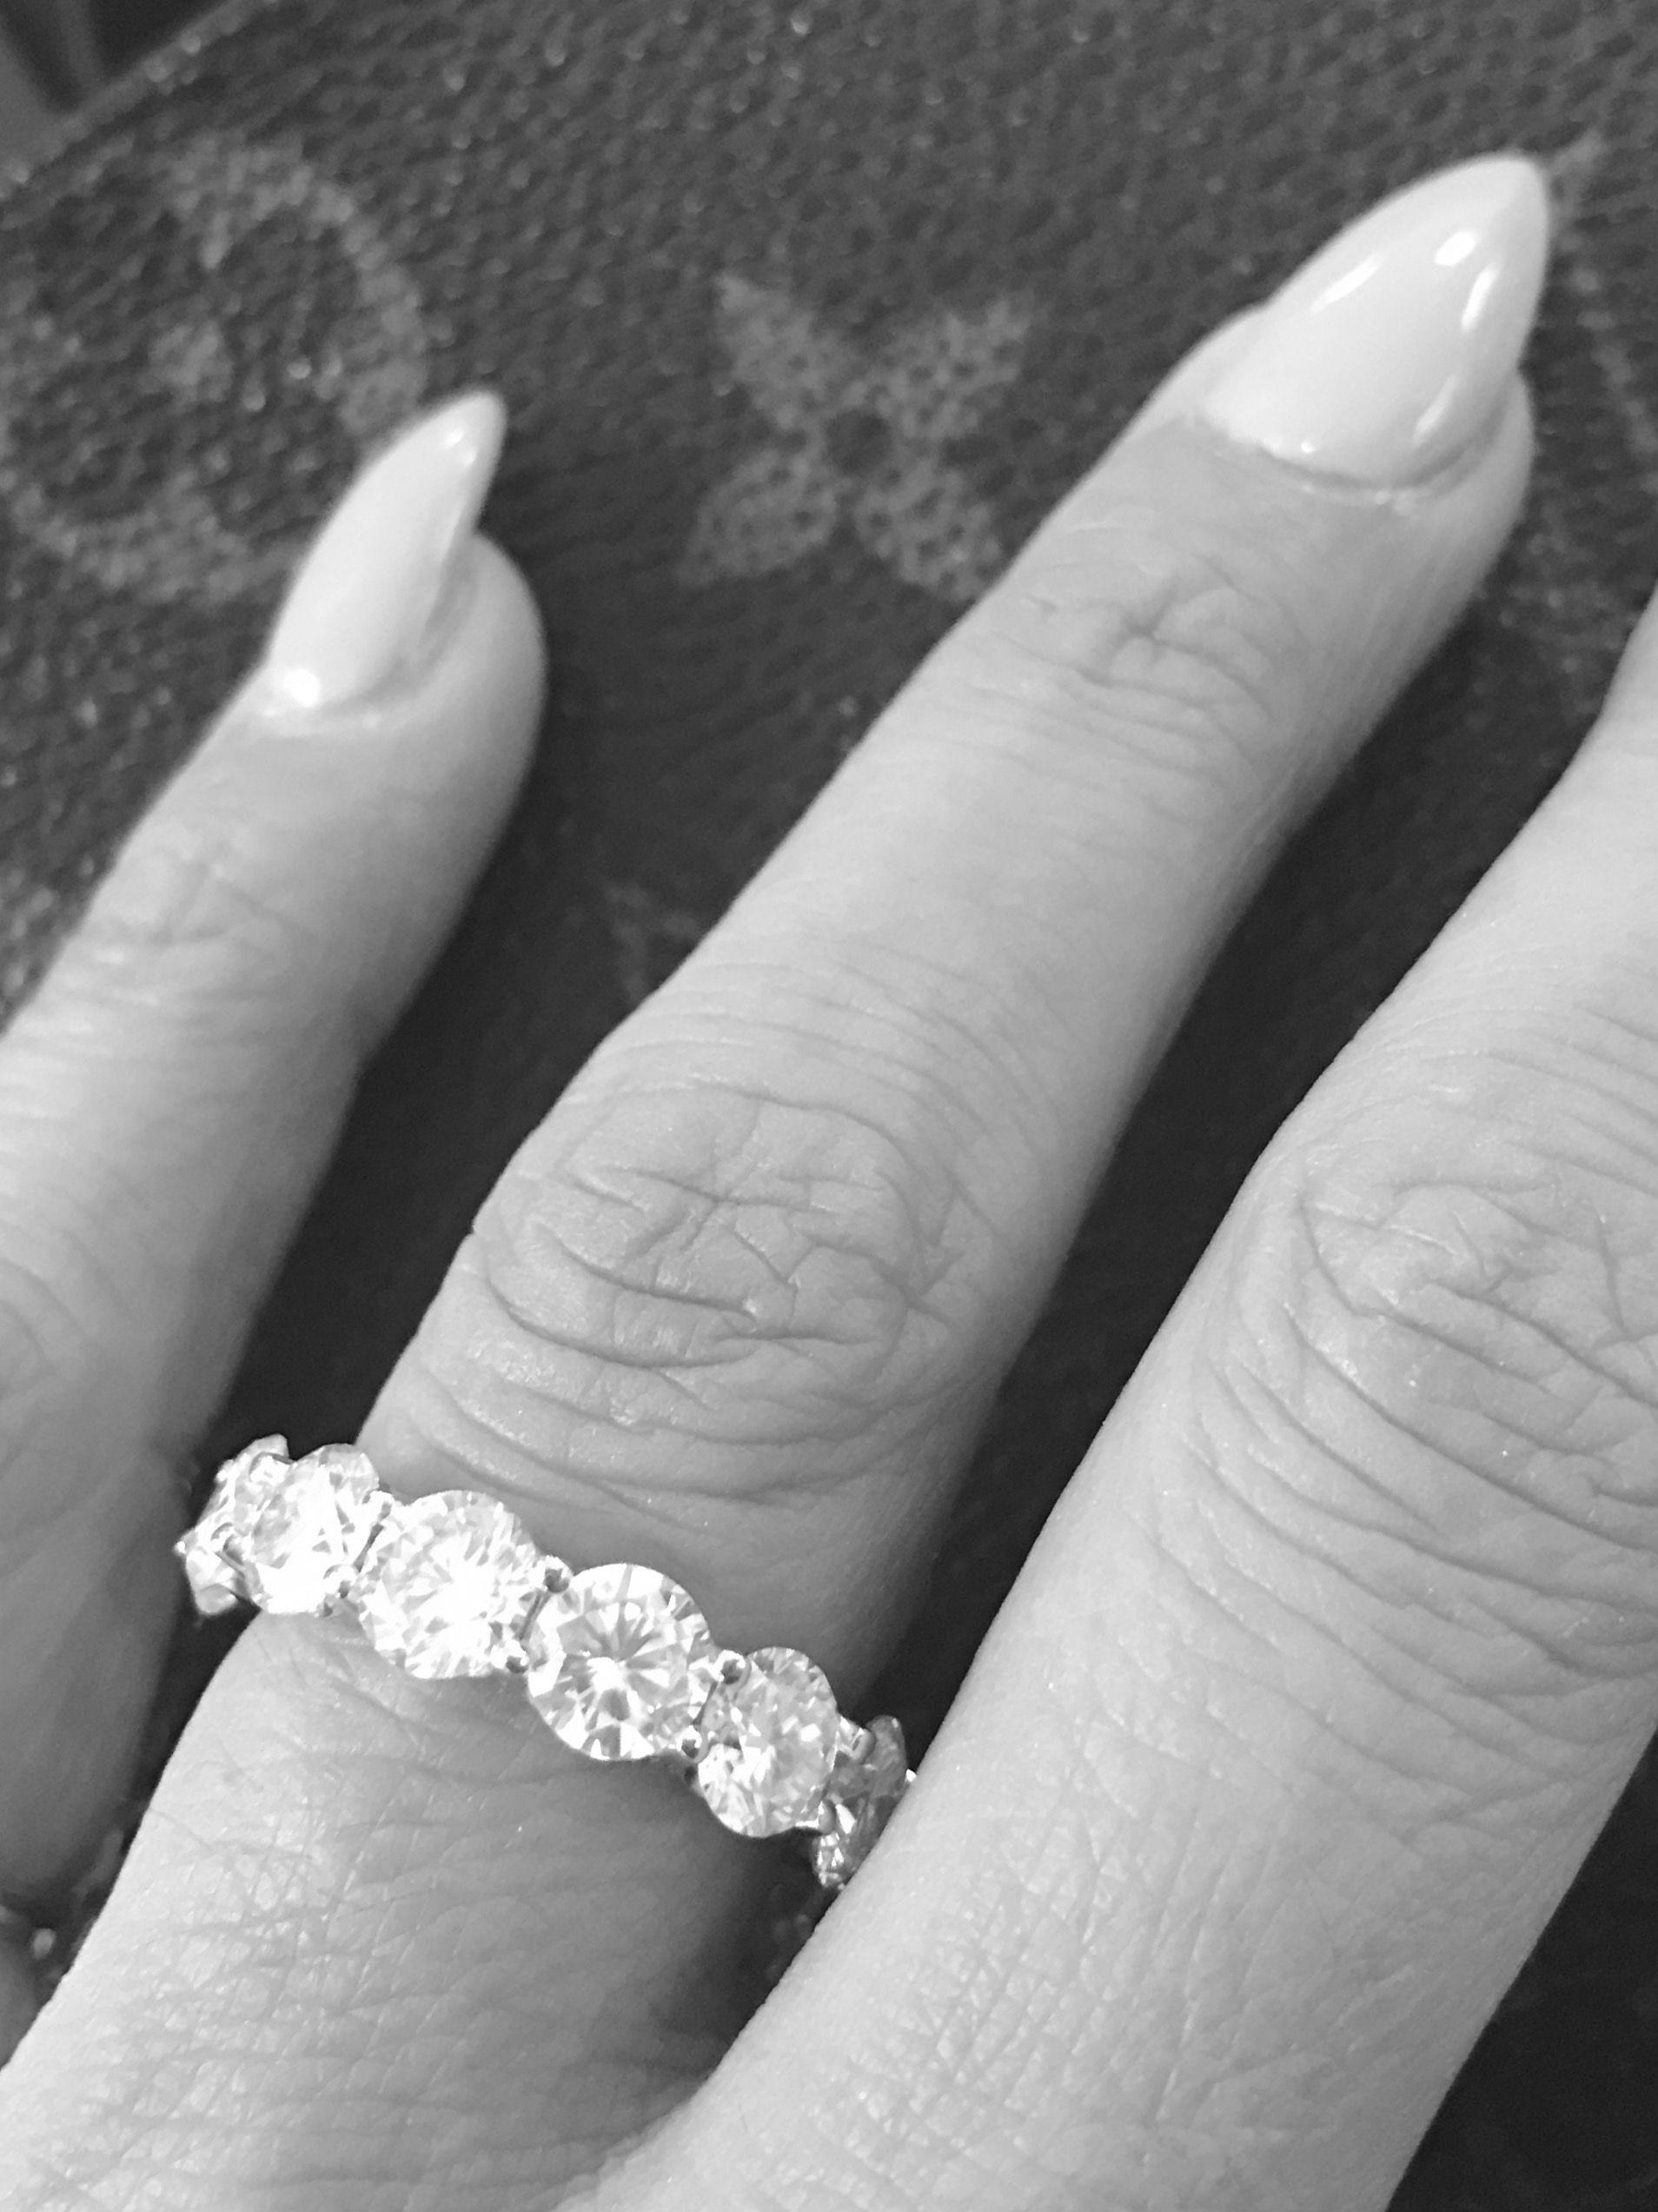 Diamonds and LV  weddingbands  weddingrings  kobelli  rounddiamonds ... 66ea7fc5a7